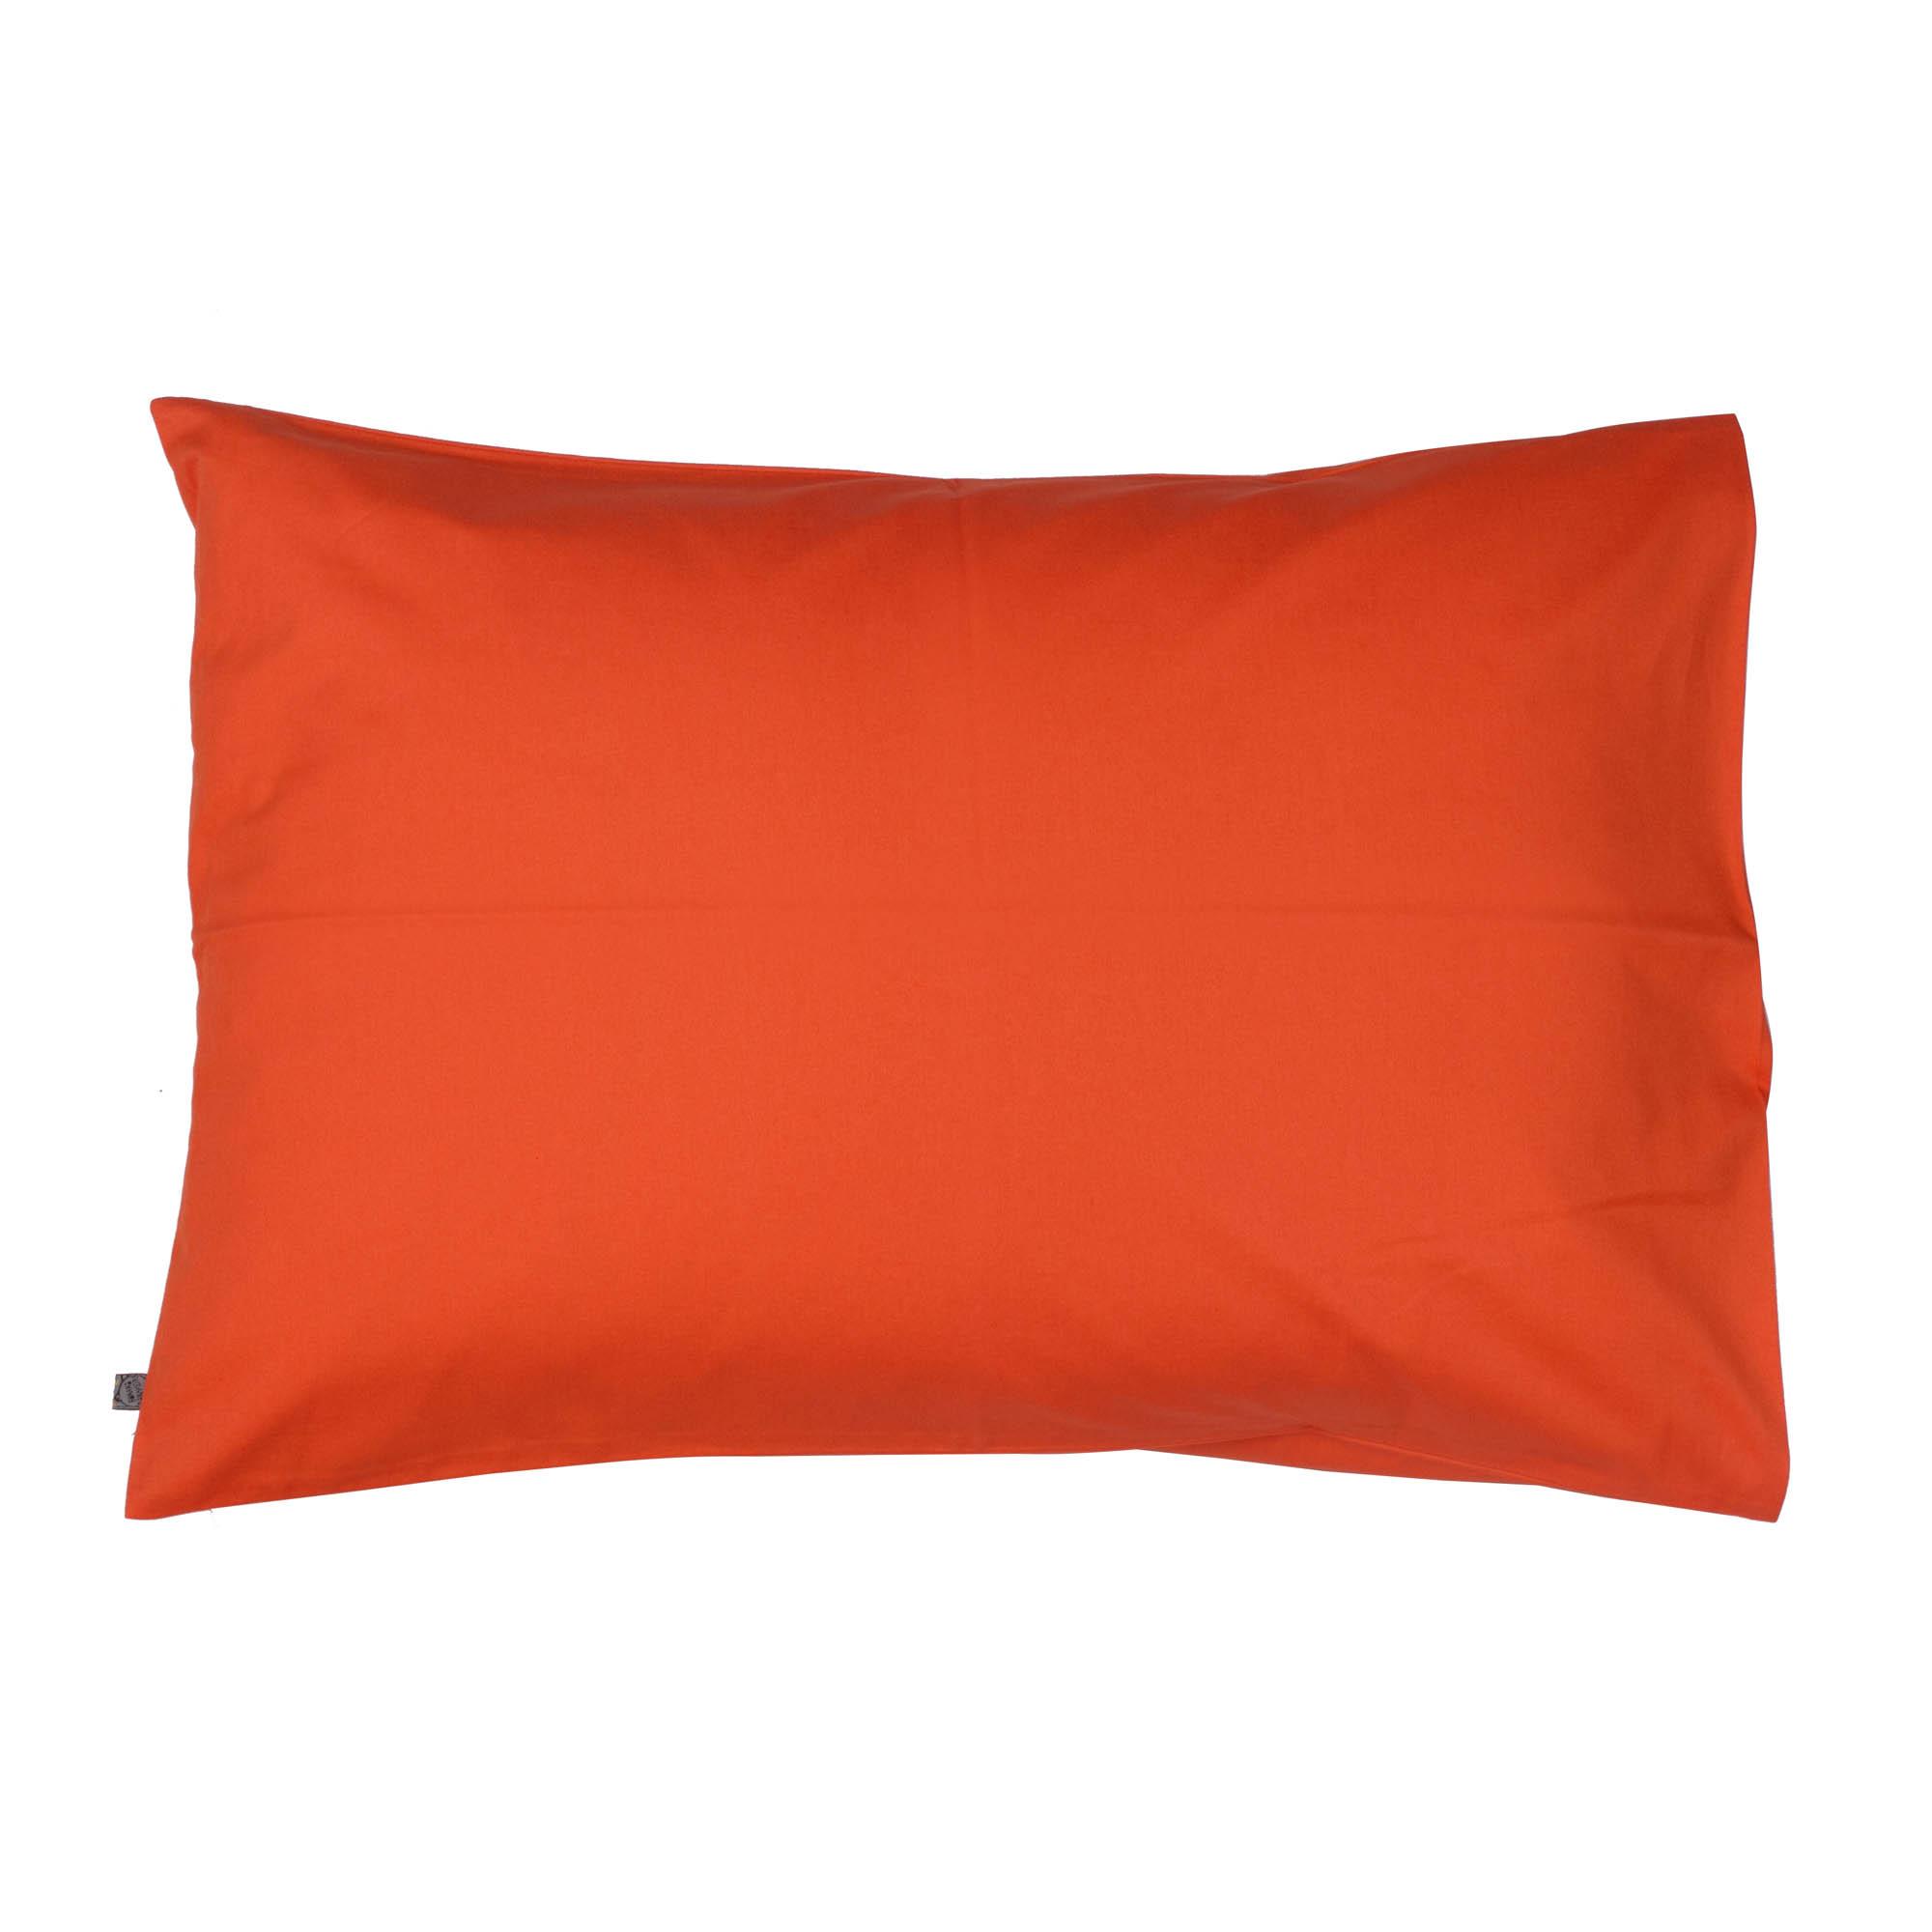 Porta travesseiro liso tangerina